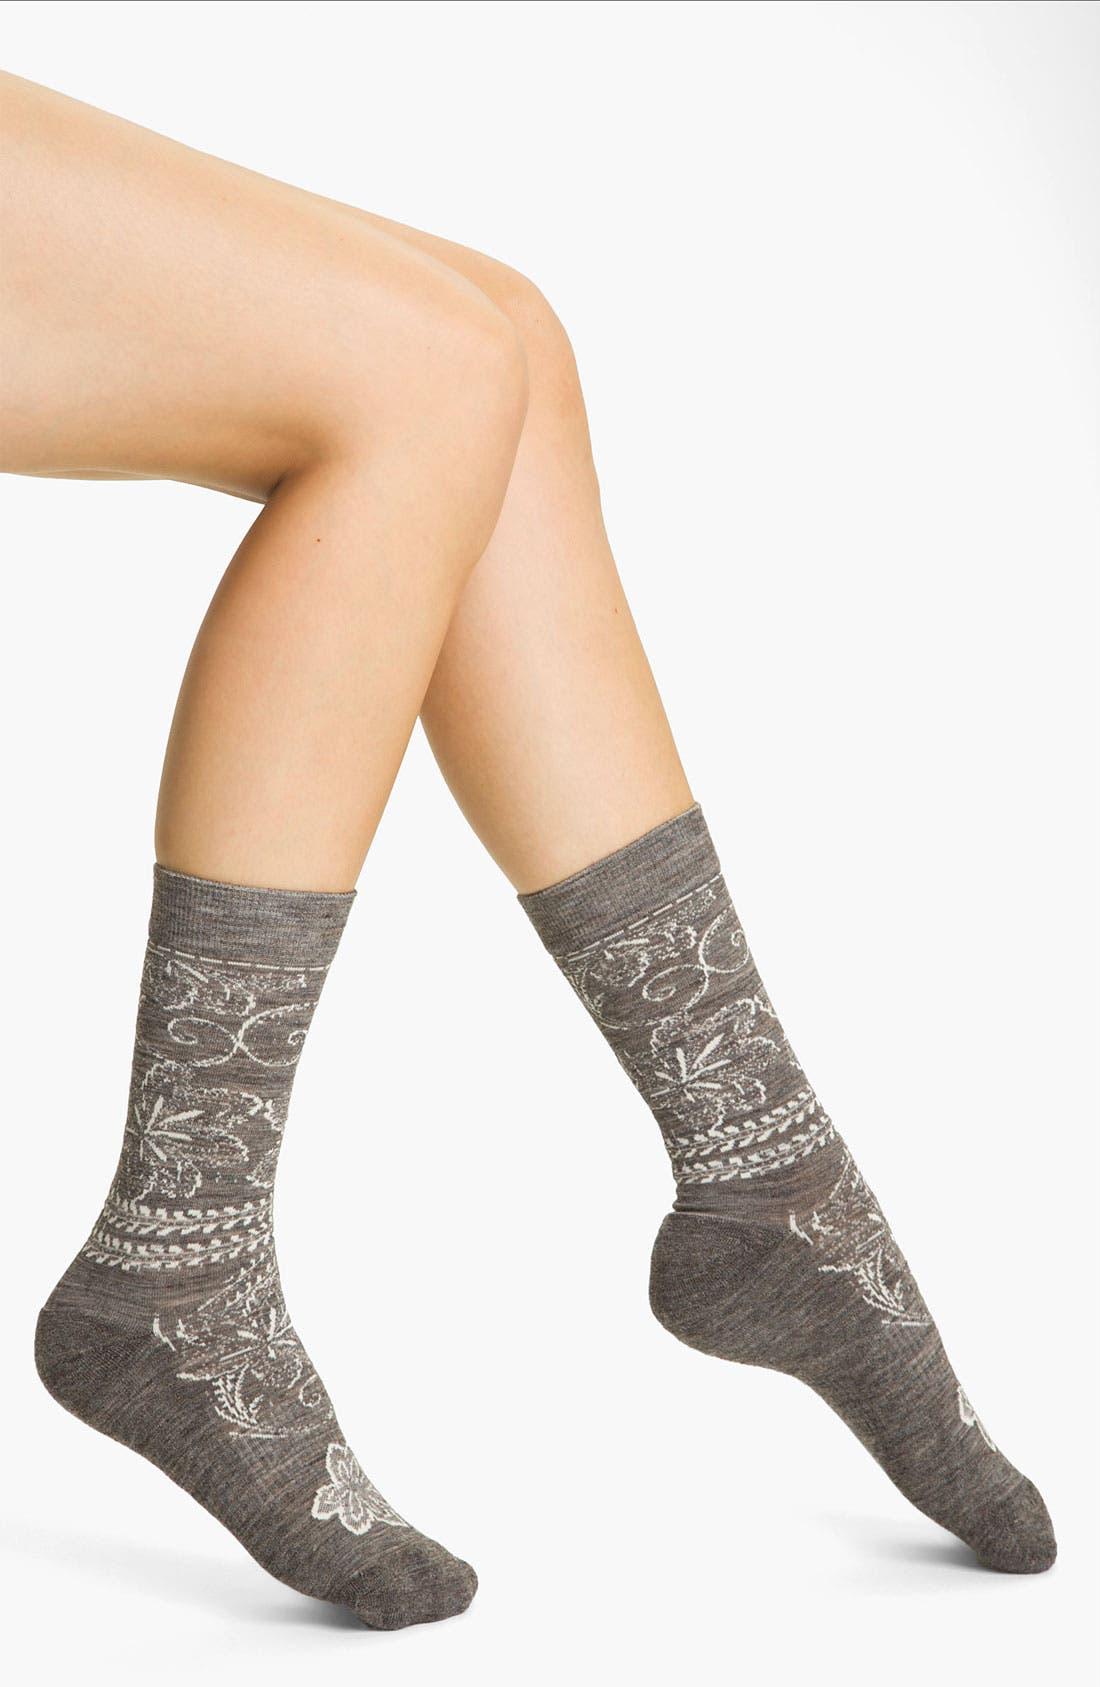 Main Image - Smartwool 'Floral Scroll' Socks